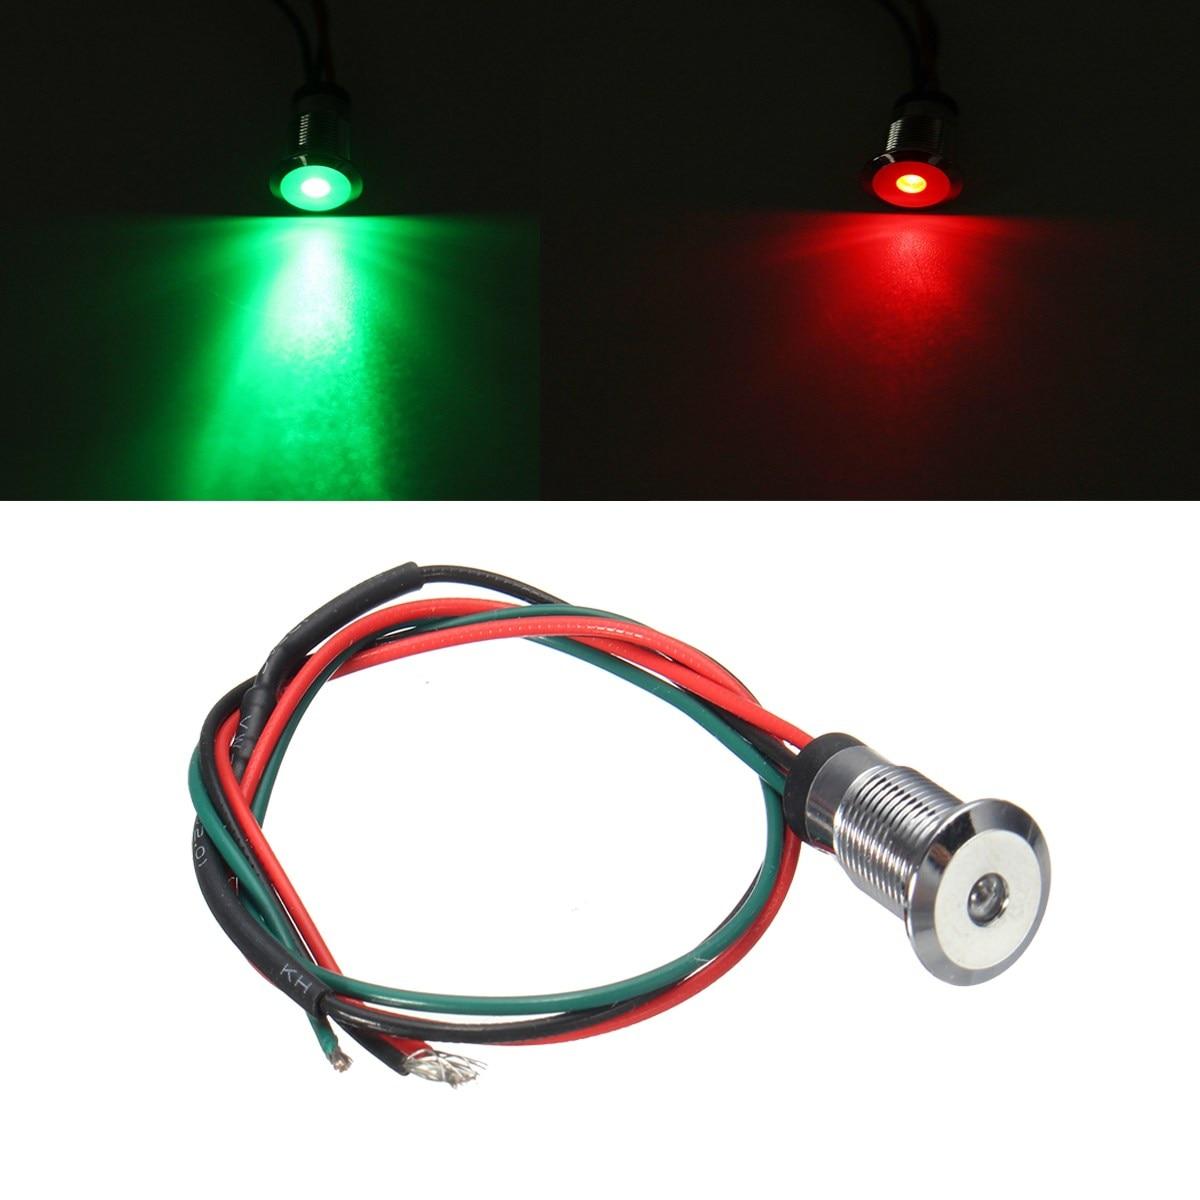 12V 8mm Warning Light Dual Color LED Green+Red Dash Pilot Panel Indicator Car Boat Truck